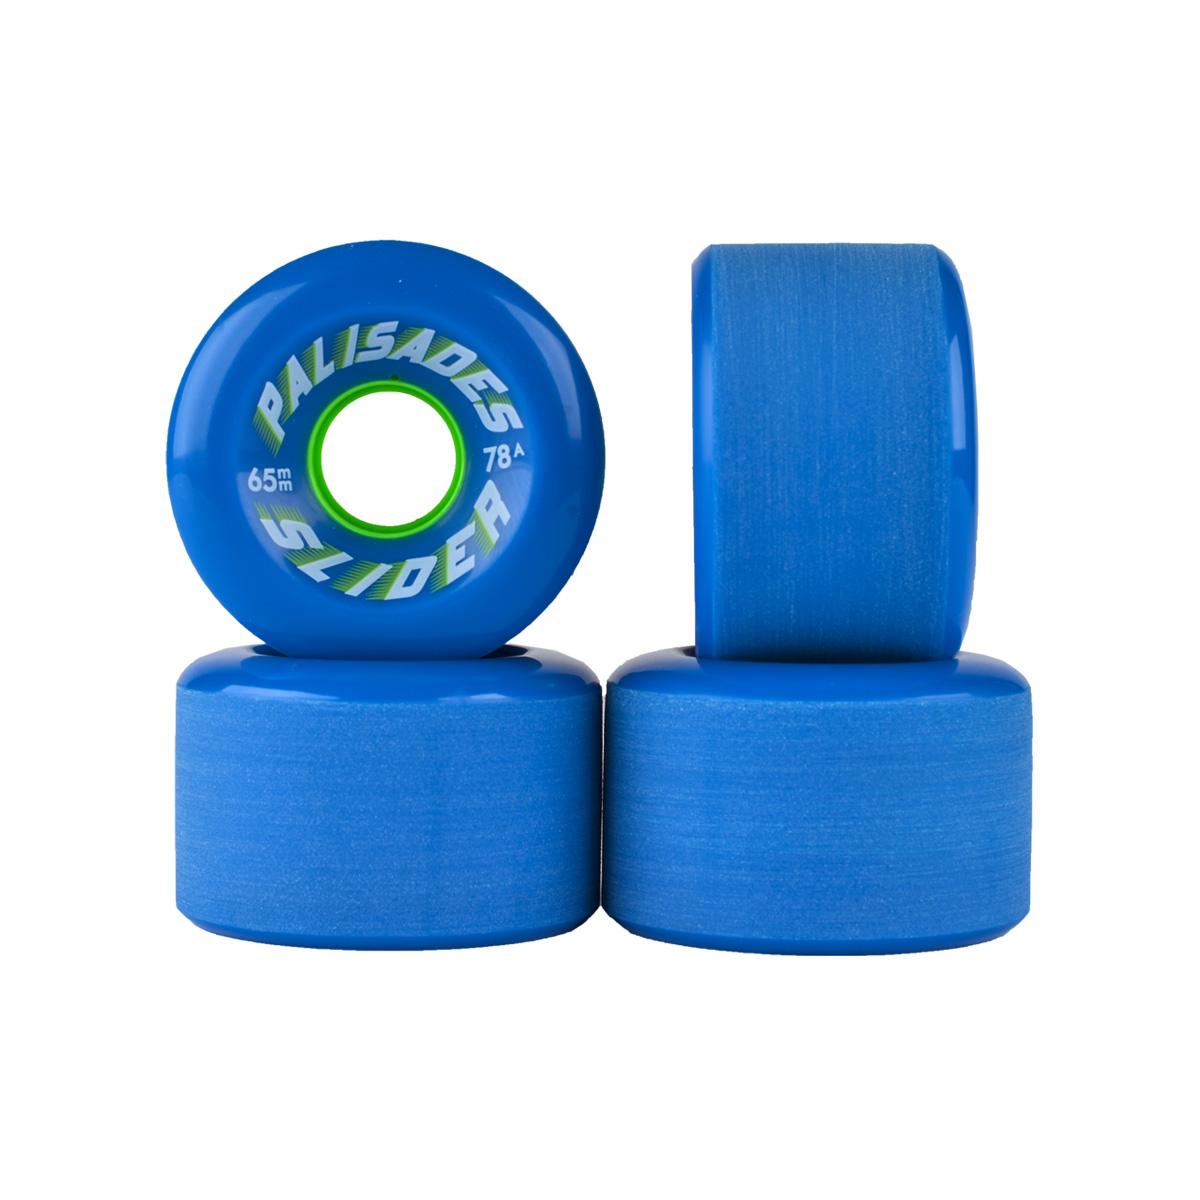 Stone ground center set w/radial edges. Blue